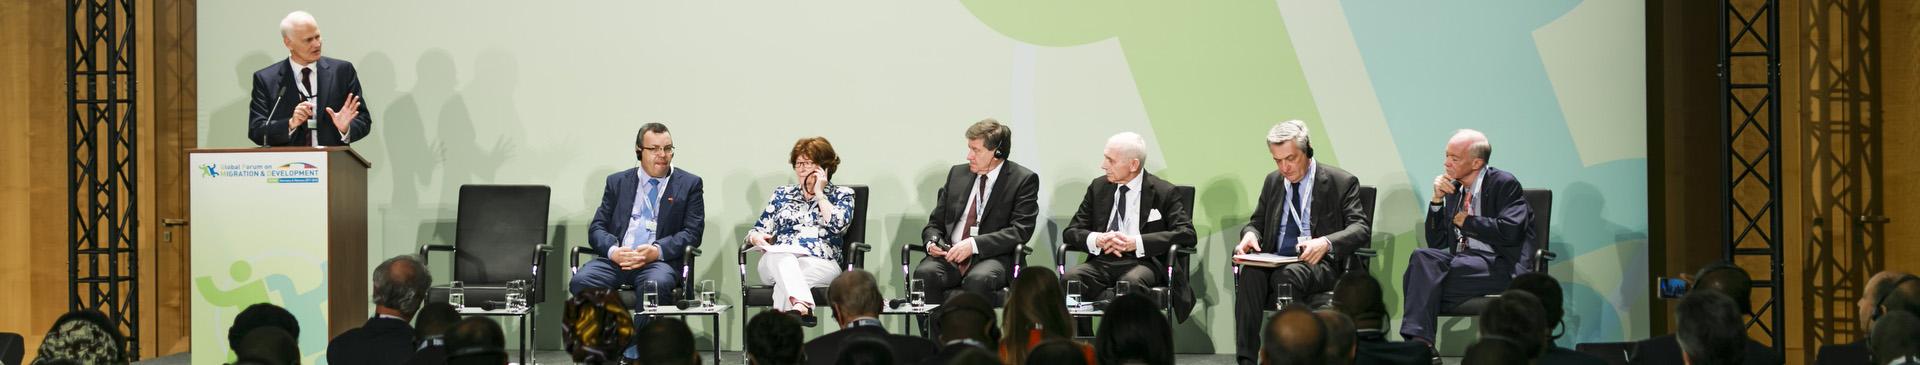 Global-Forum-1